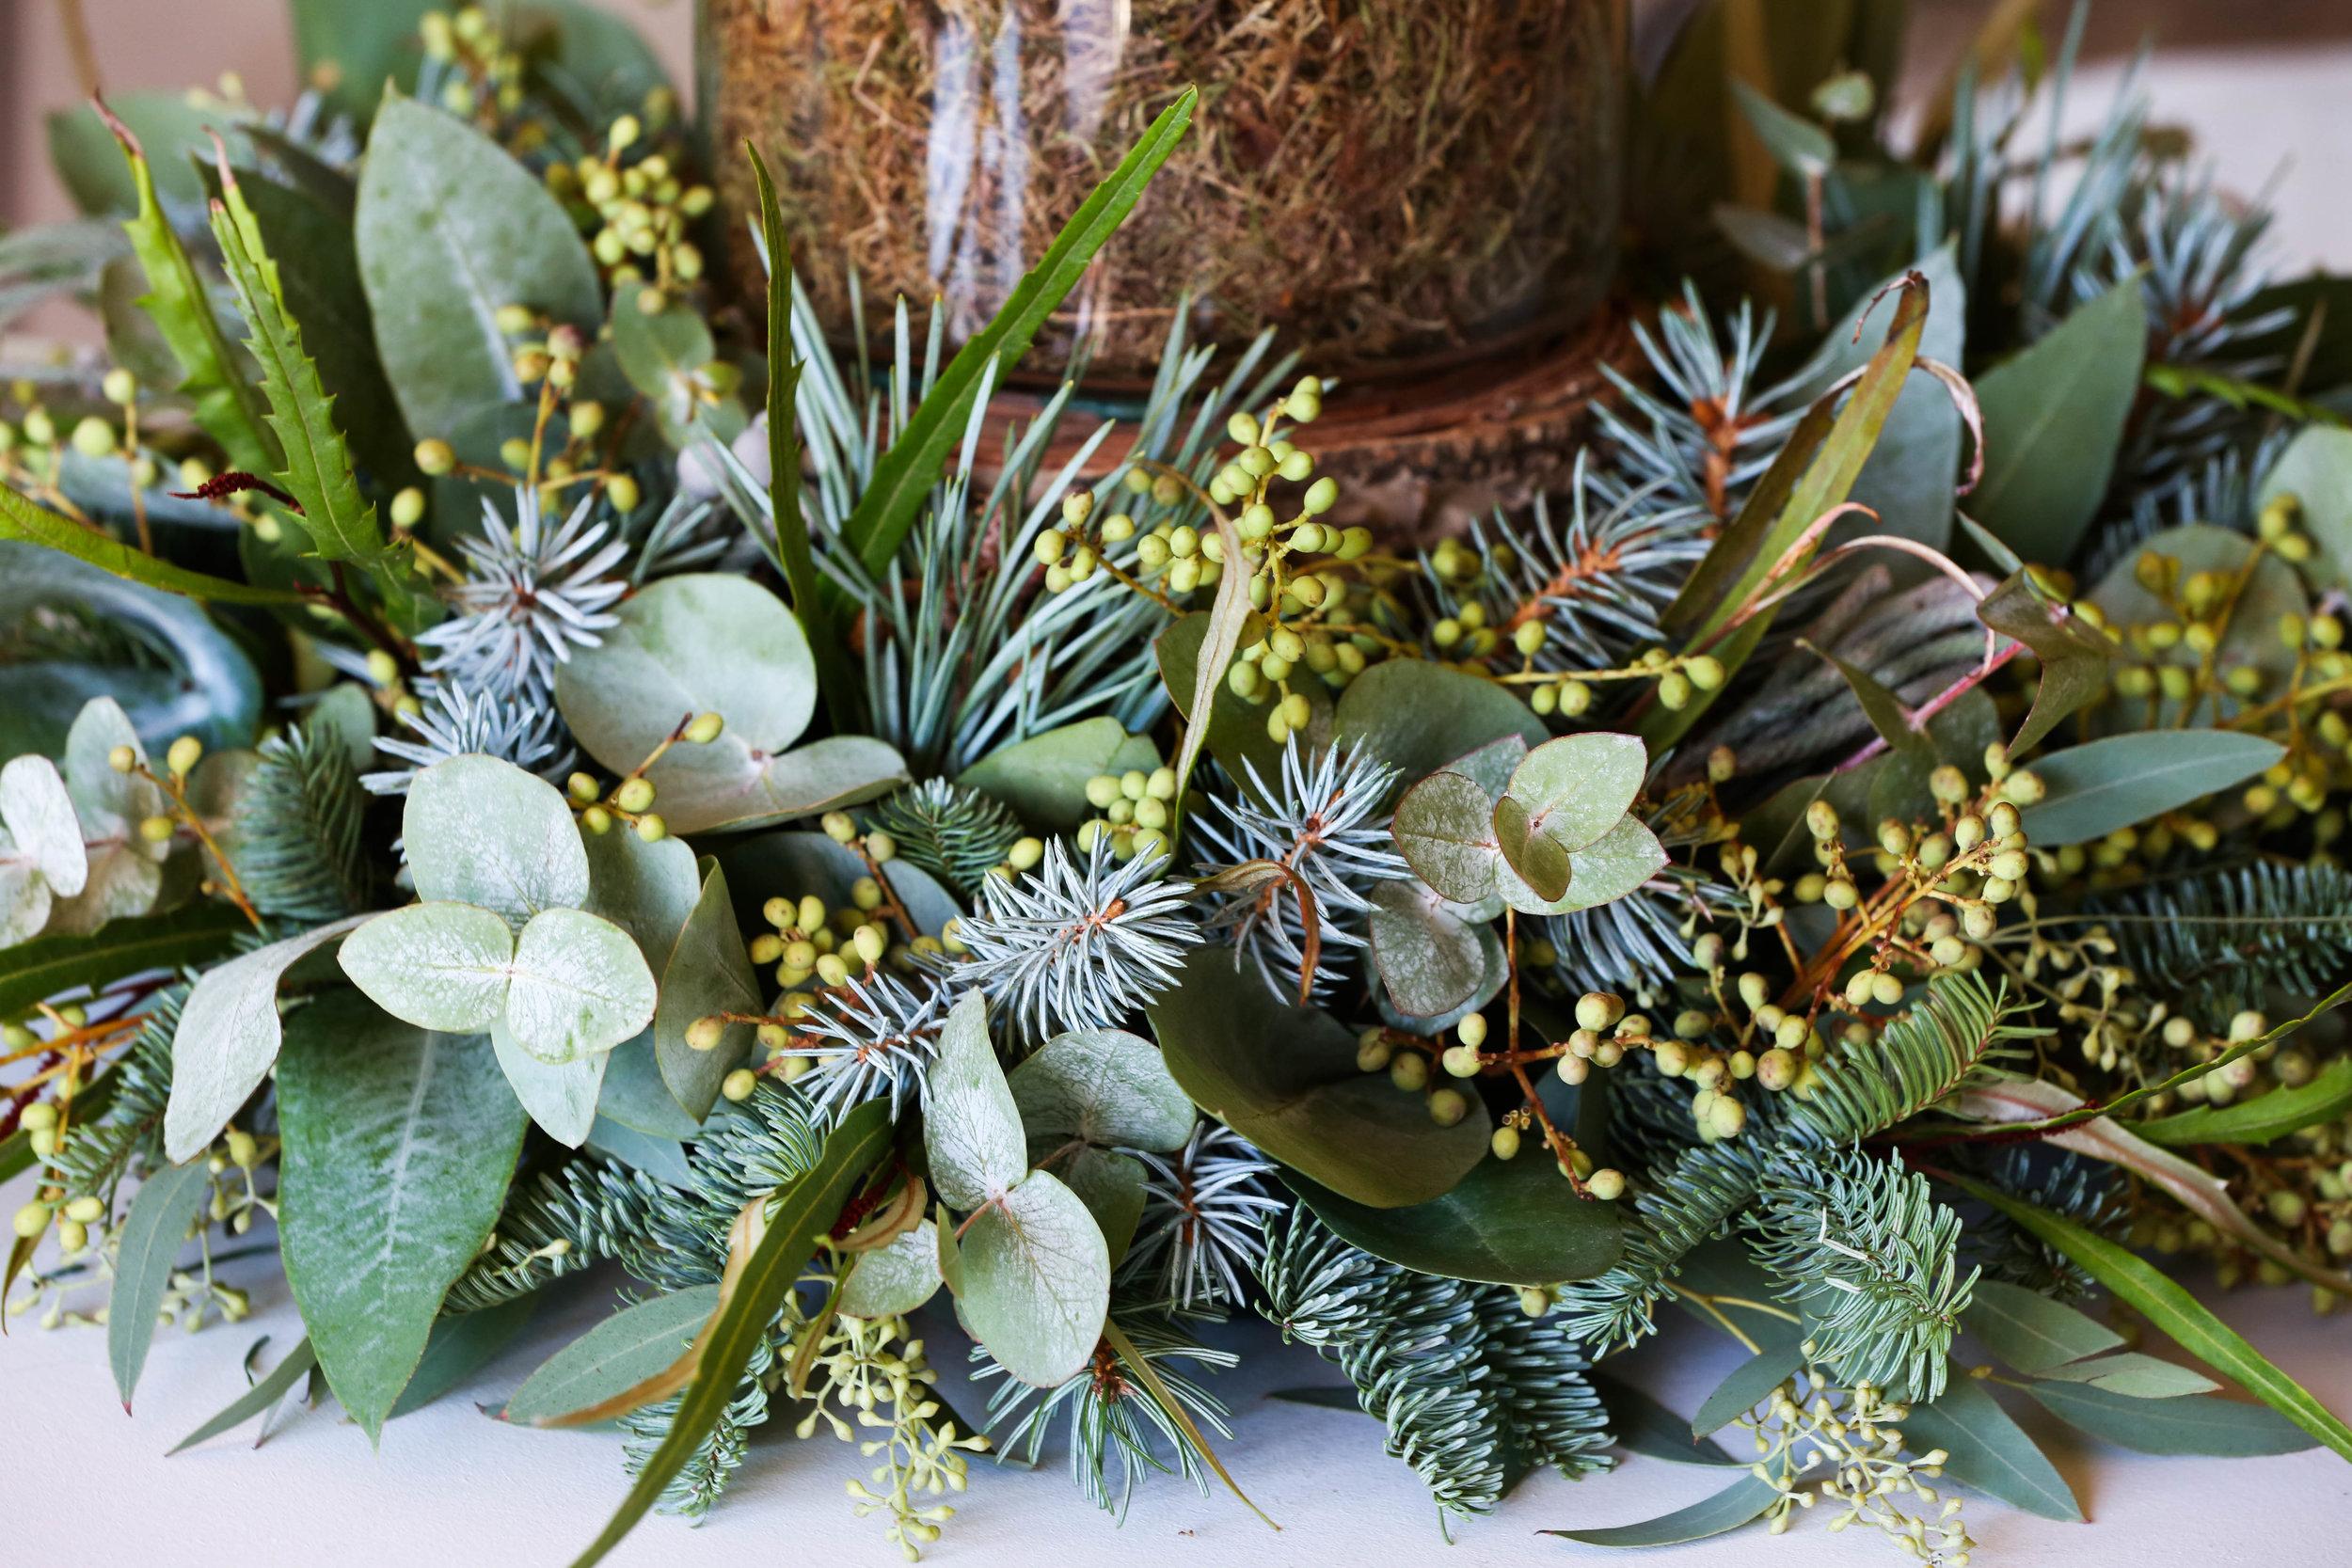 Festive foliage ring